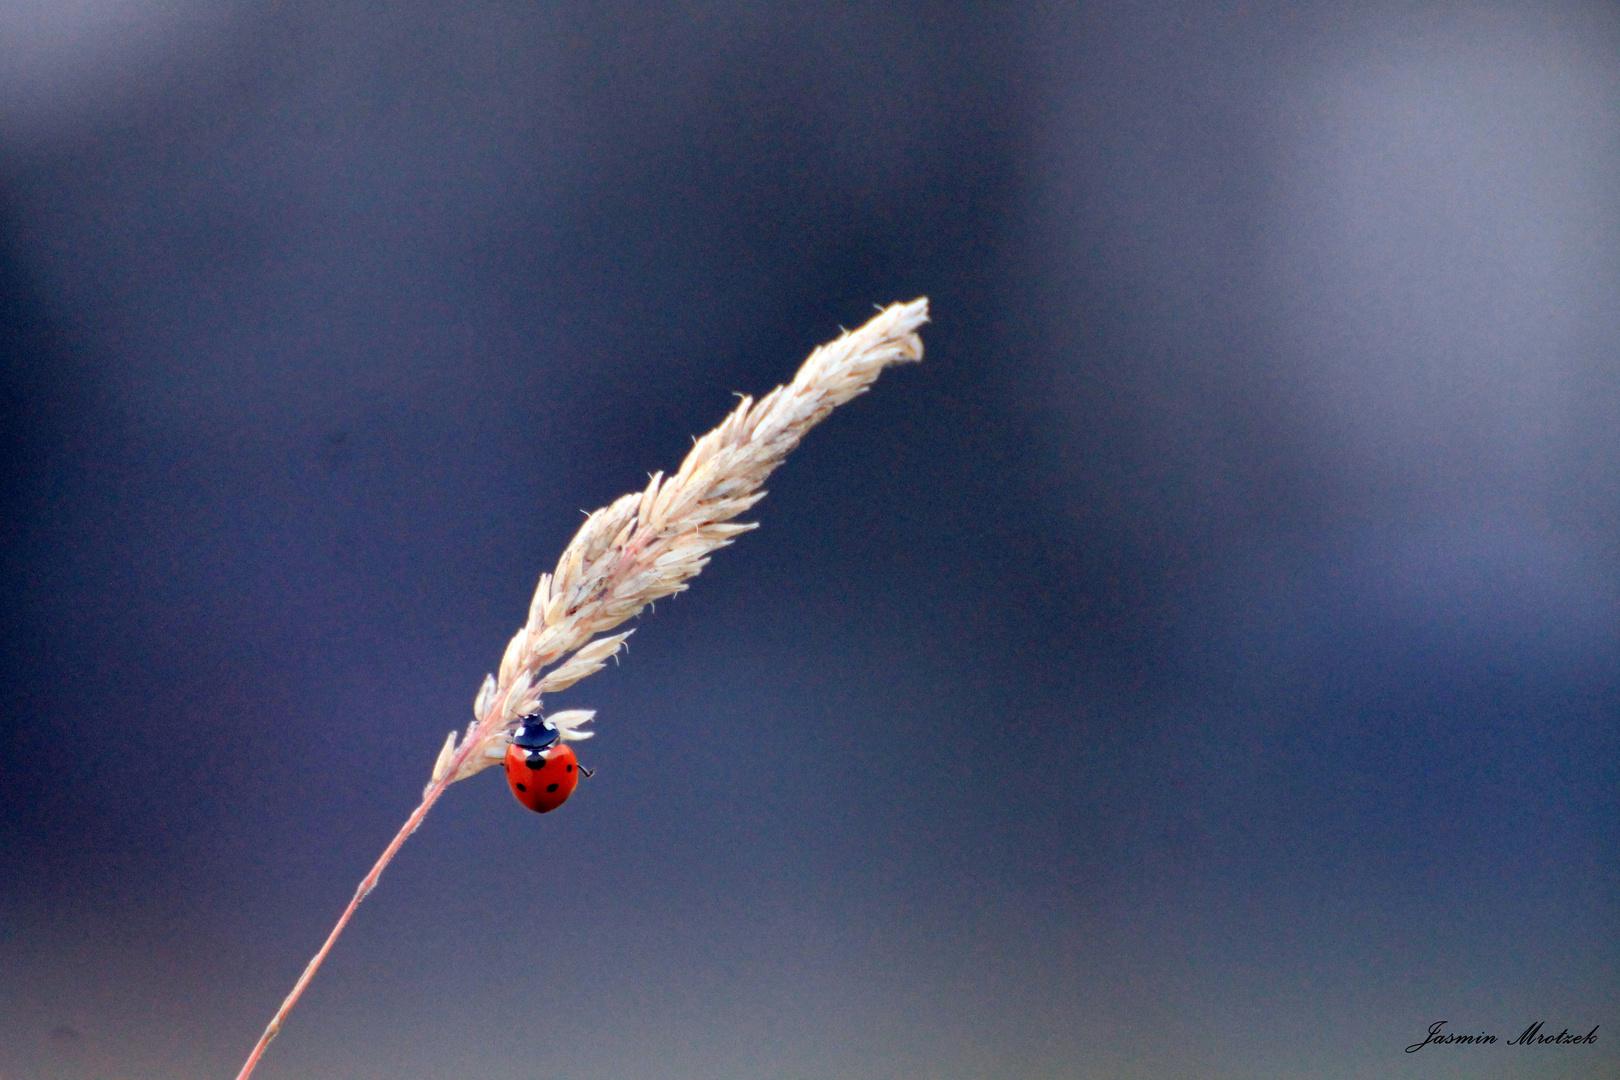 Ladybug falls down